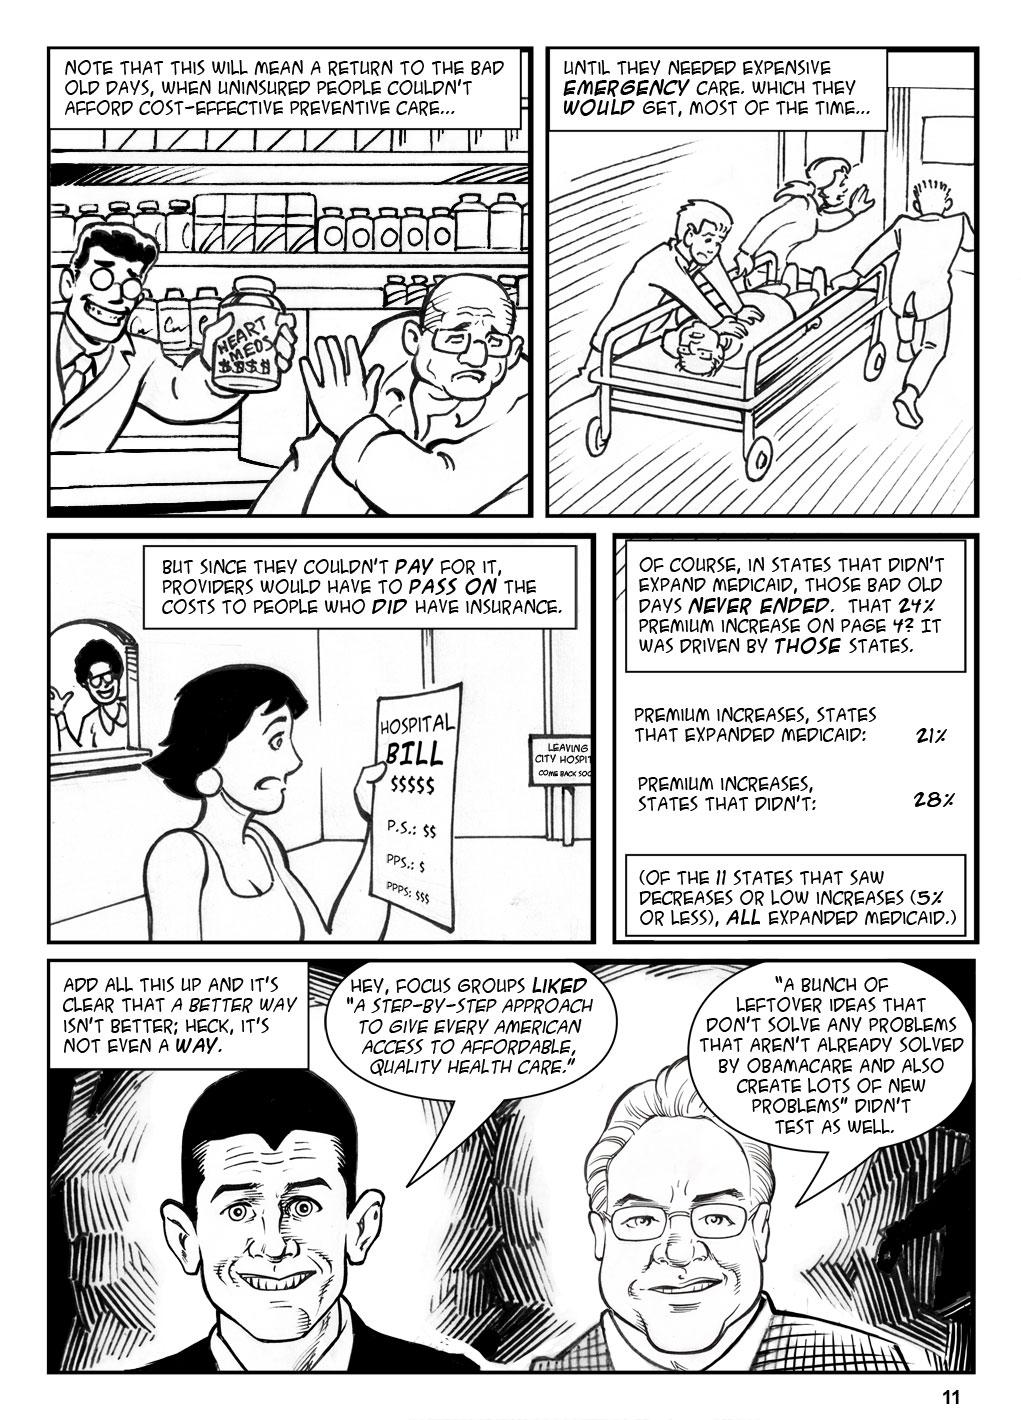 ObamacarePage11